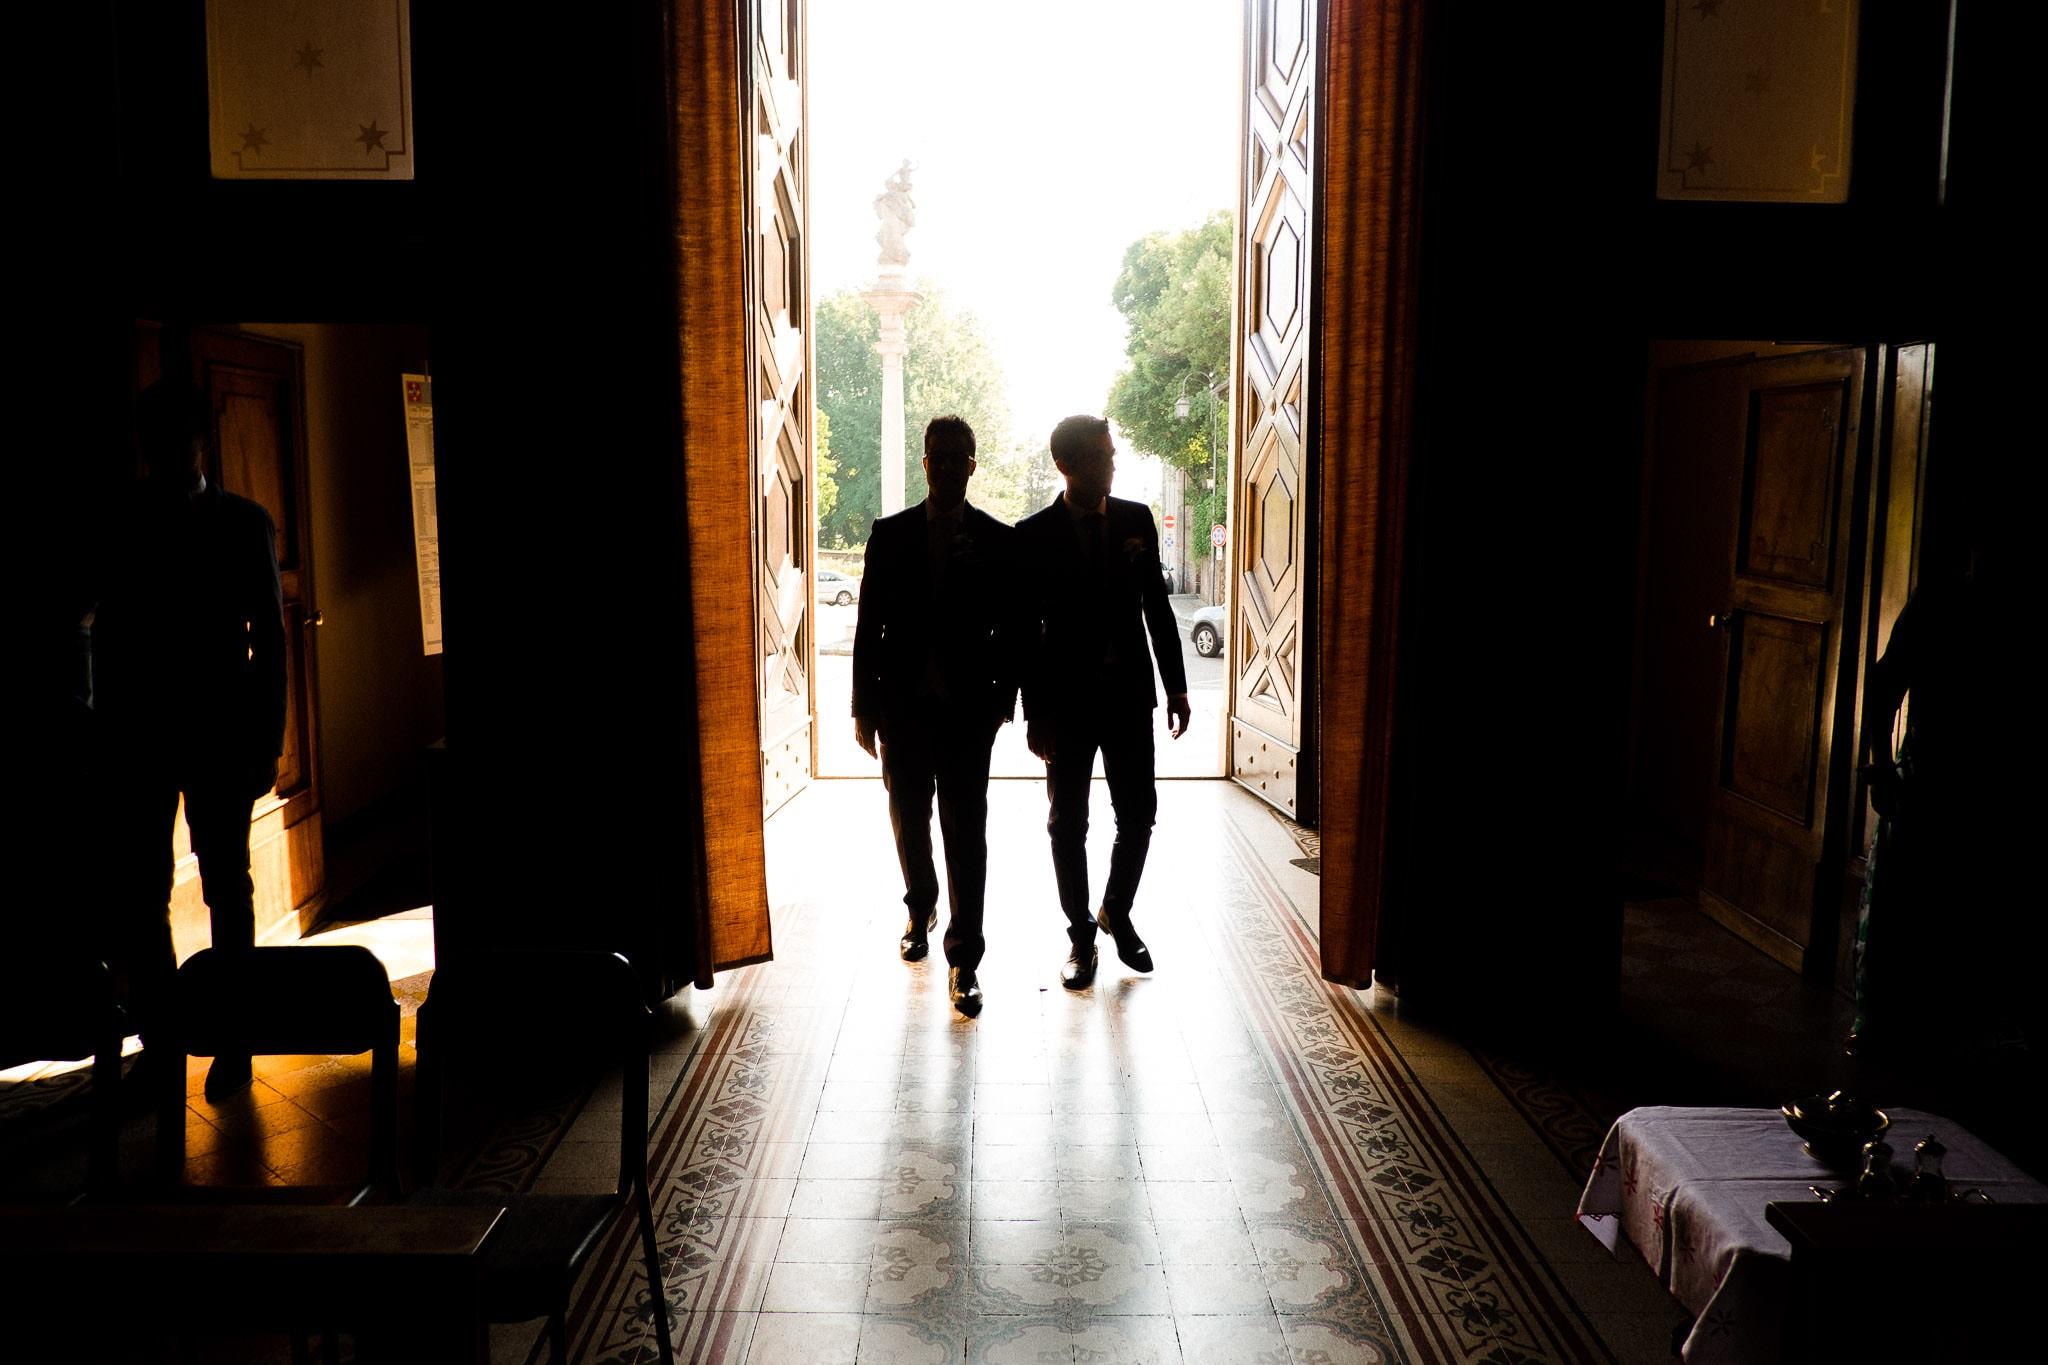 fotografo matrimonio cascina diodona varese lucarossifoto 00006